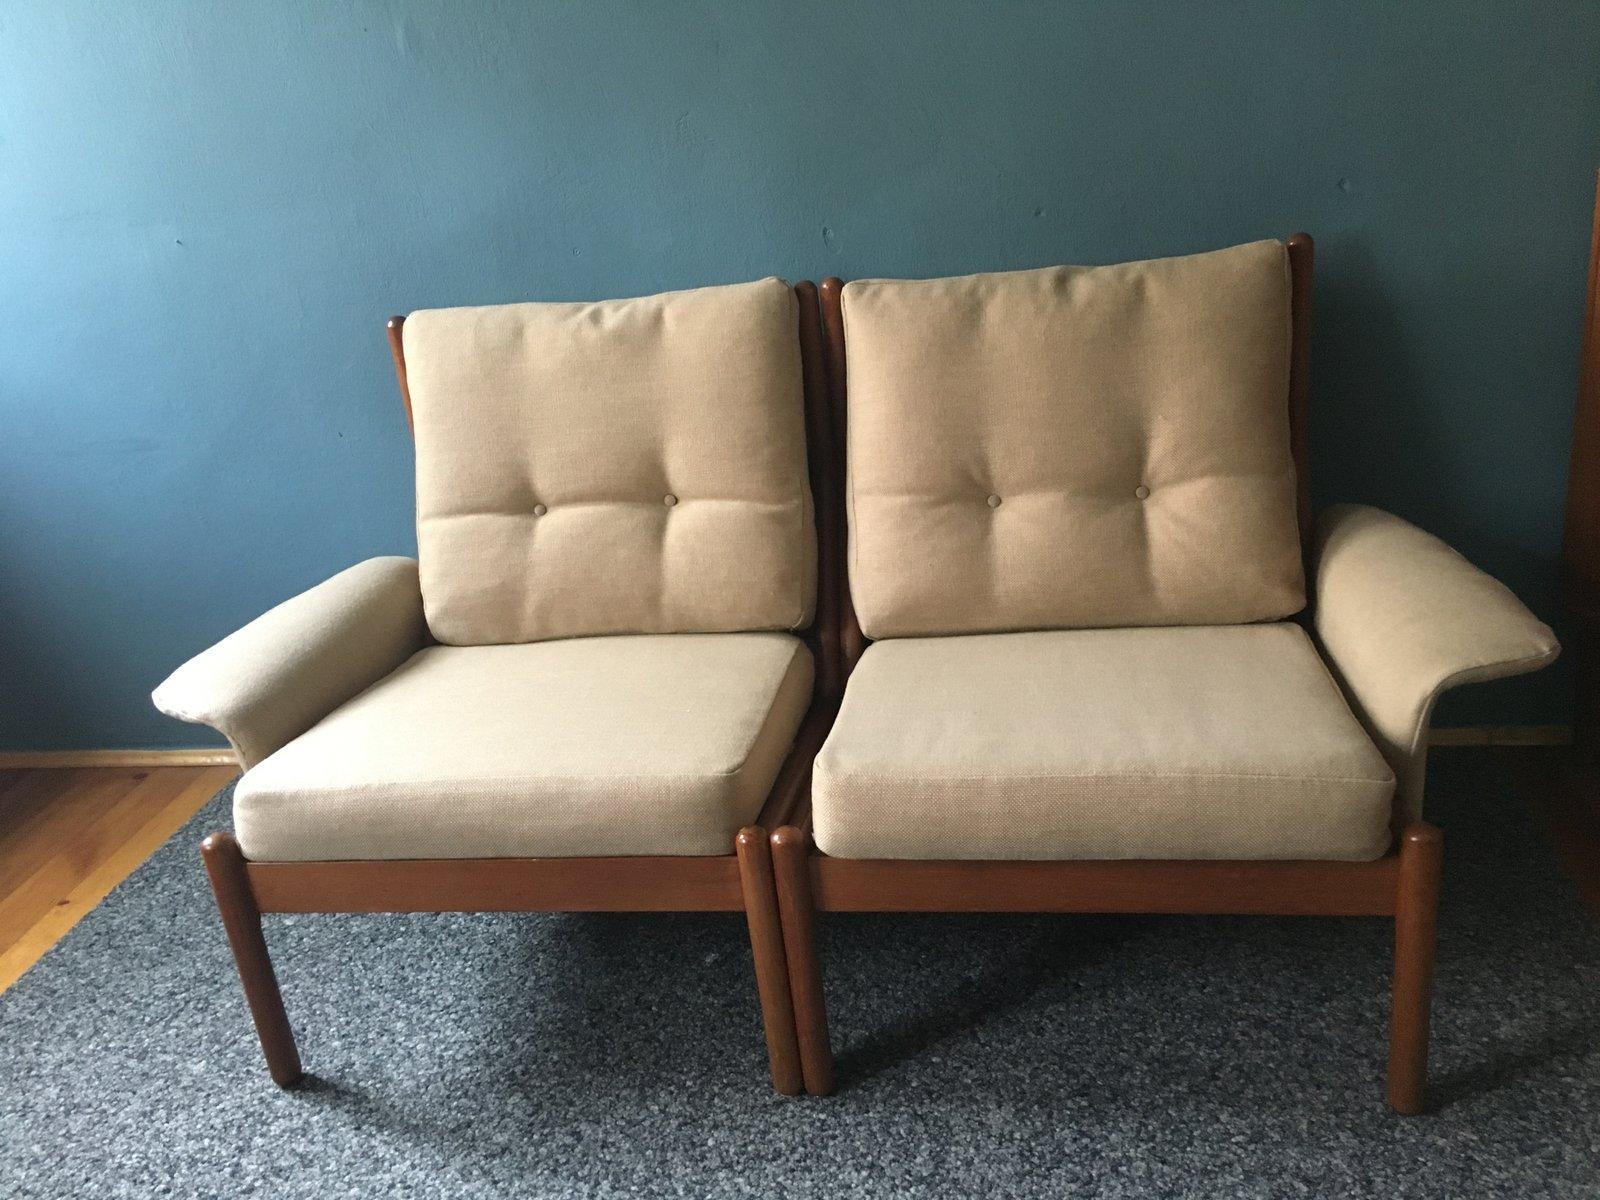 modulares d nisches teak sofa von niels bach 1960er bei. Black Bedroom Furniture Sets. Home Design Ideas